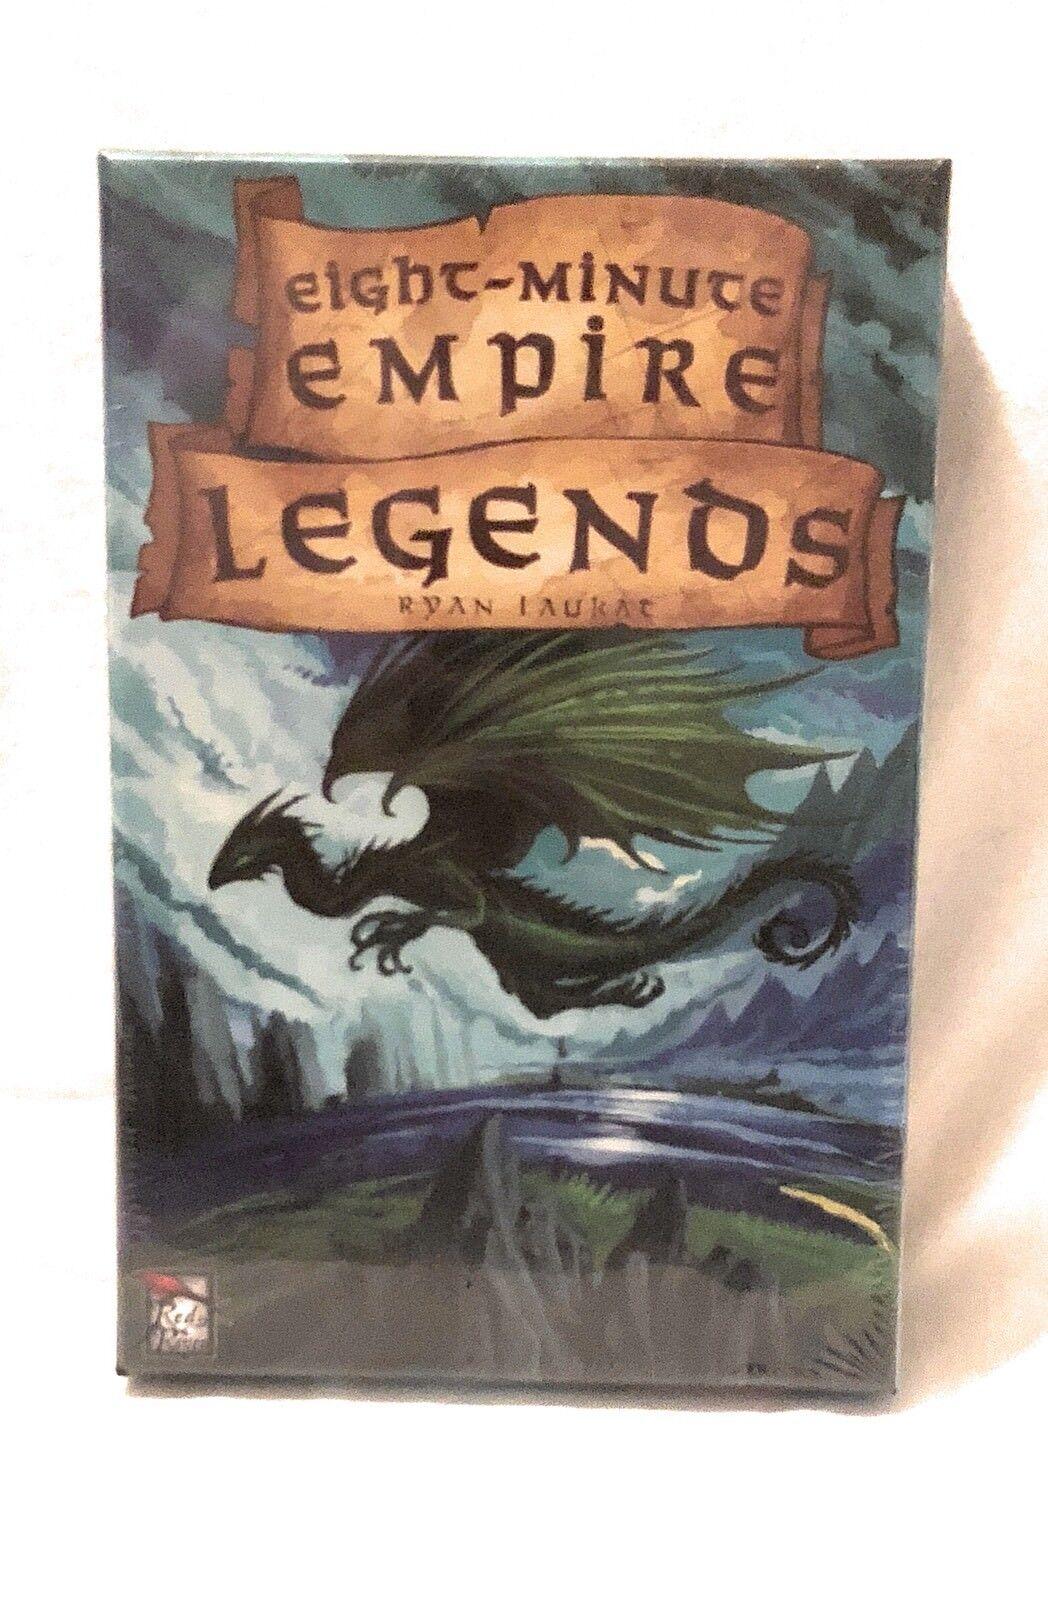 Eight-Minute Empire  Legends Ryan Laukat New